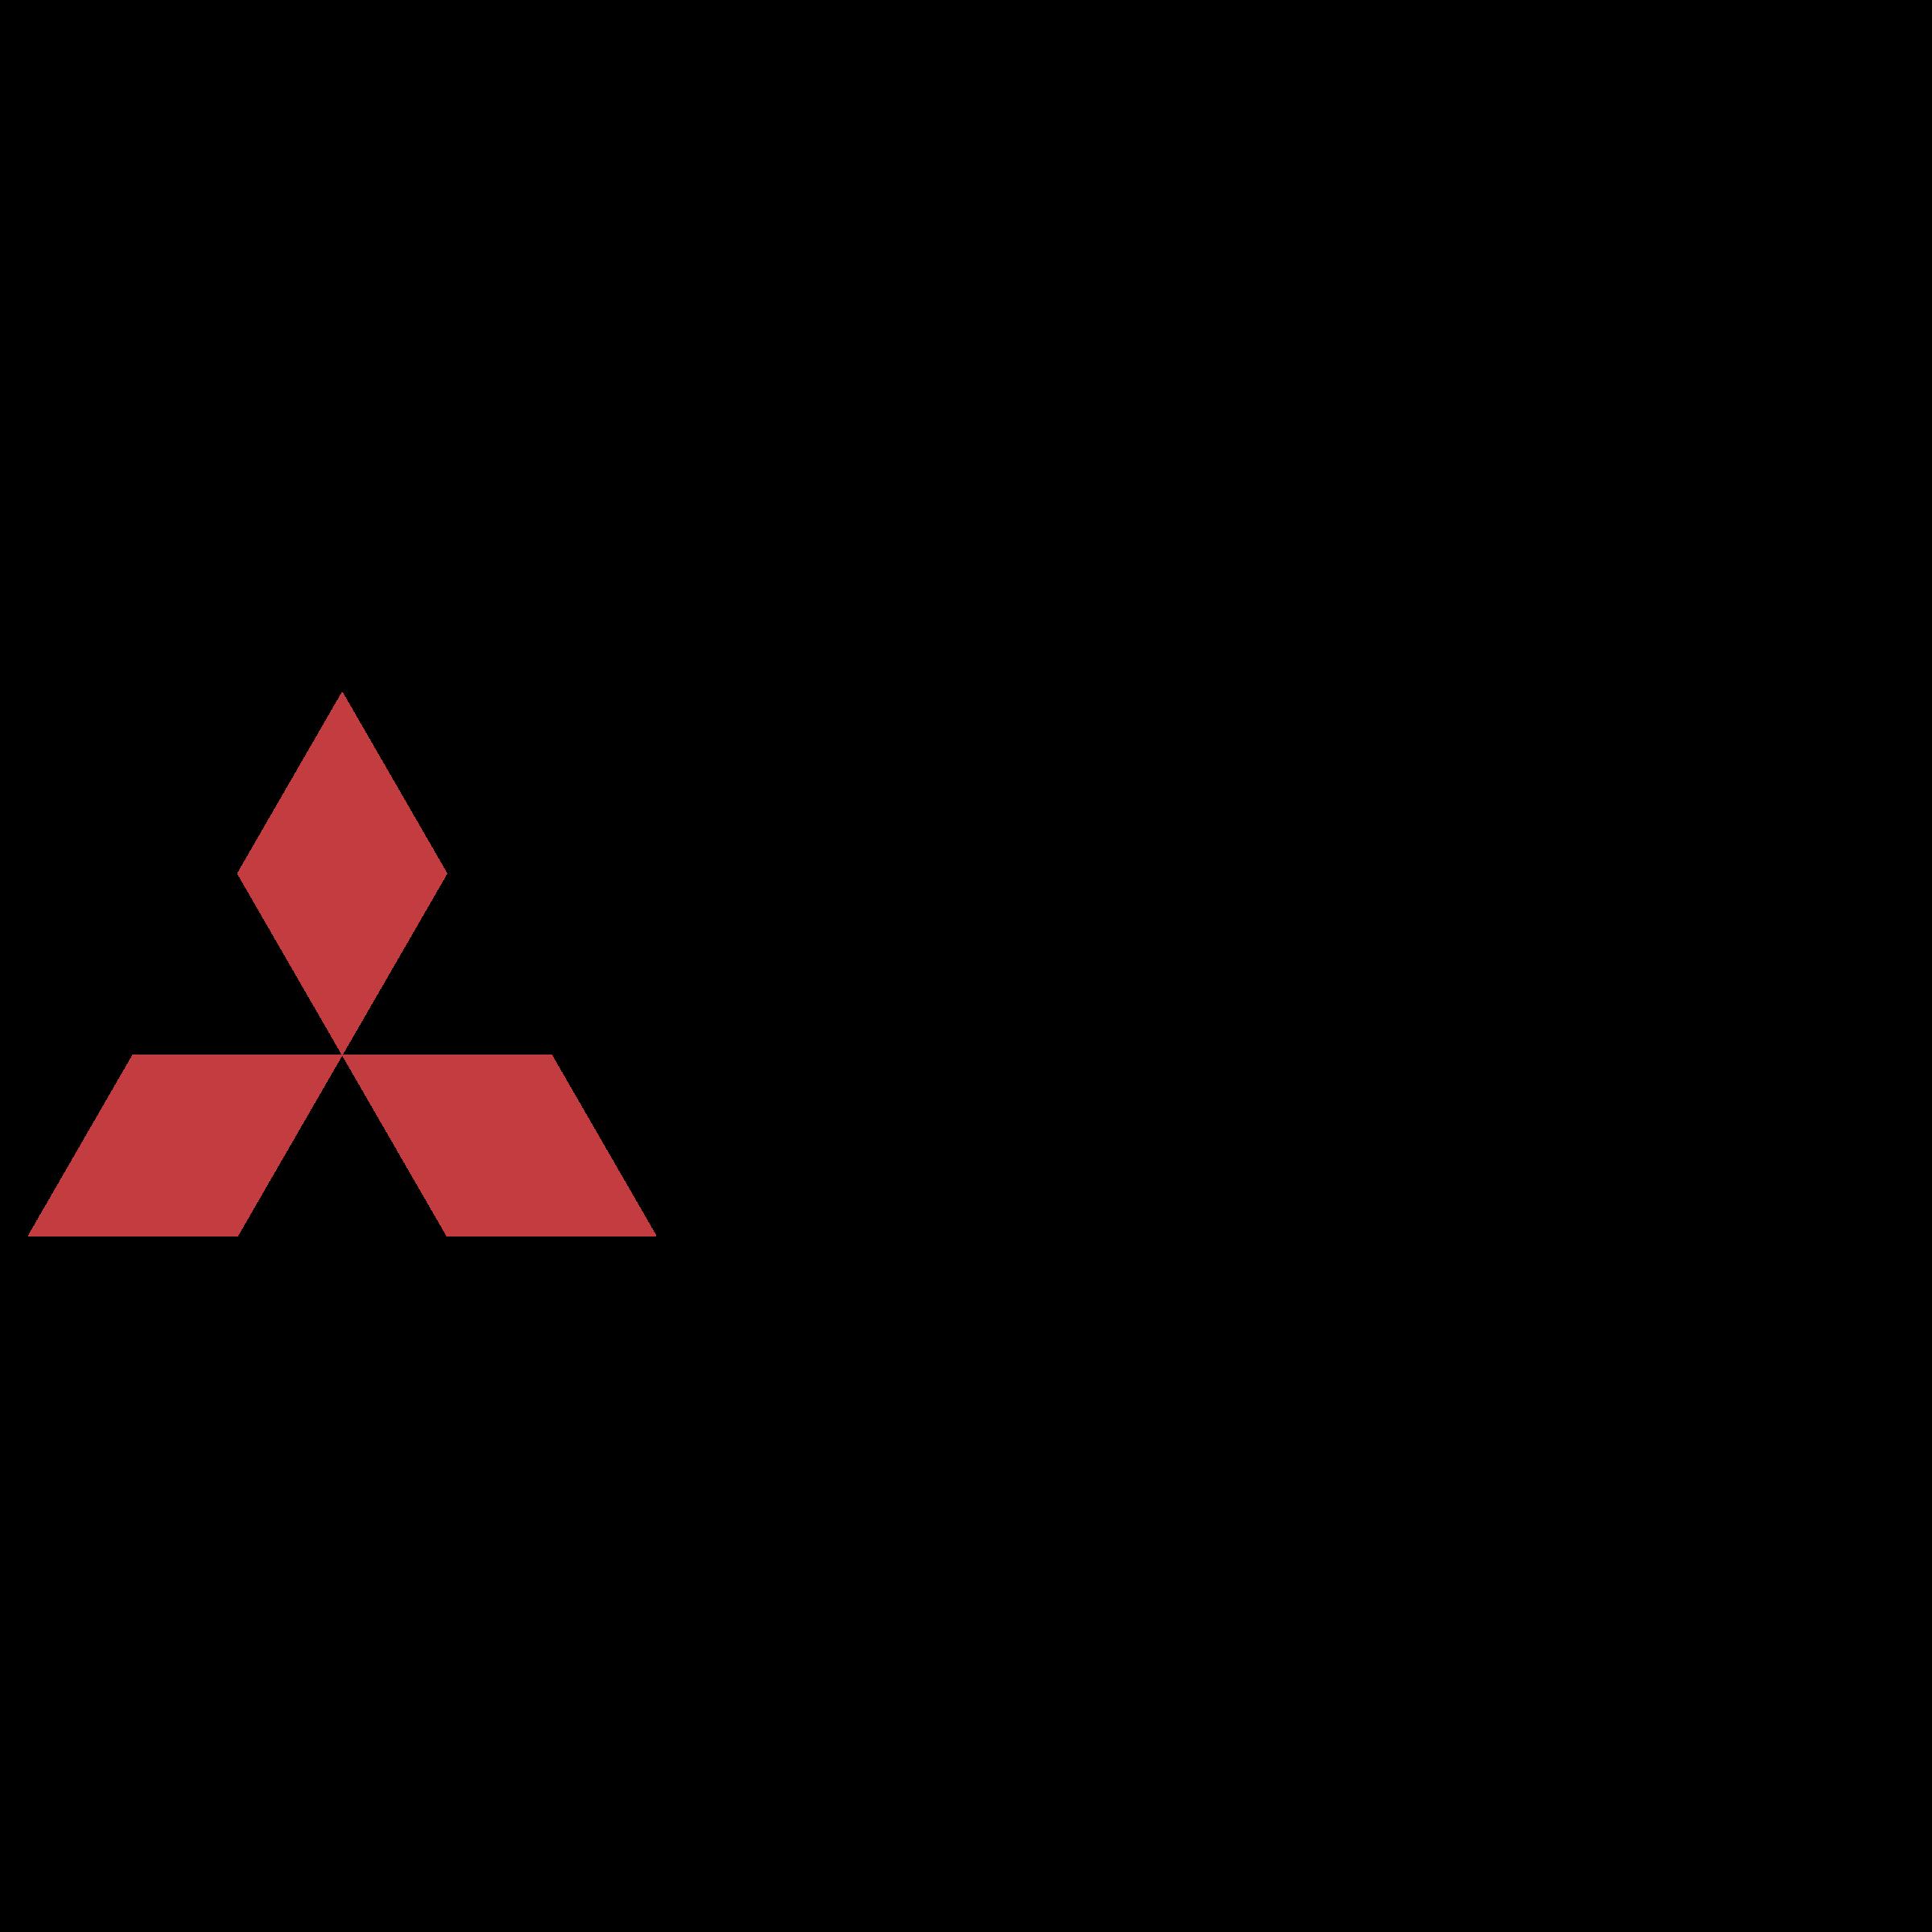 mitsubishi-electric-logo-png-transparent.png